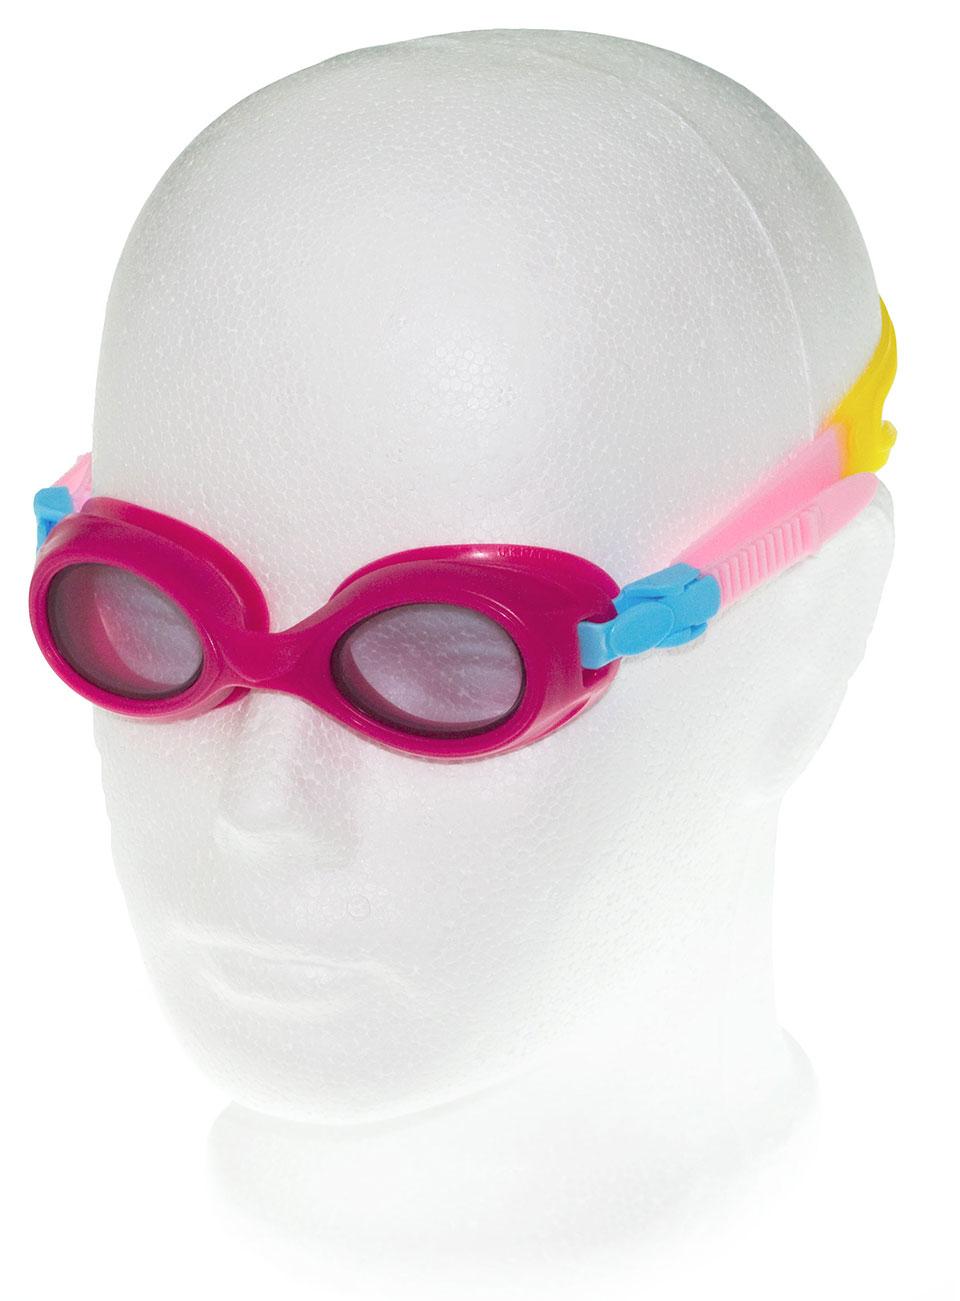 babies-prescription-swimming-goggles-pink-dsc-0016.jpg